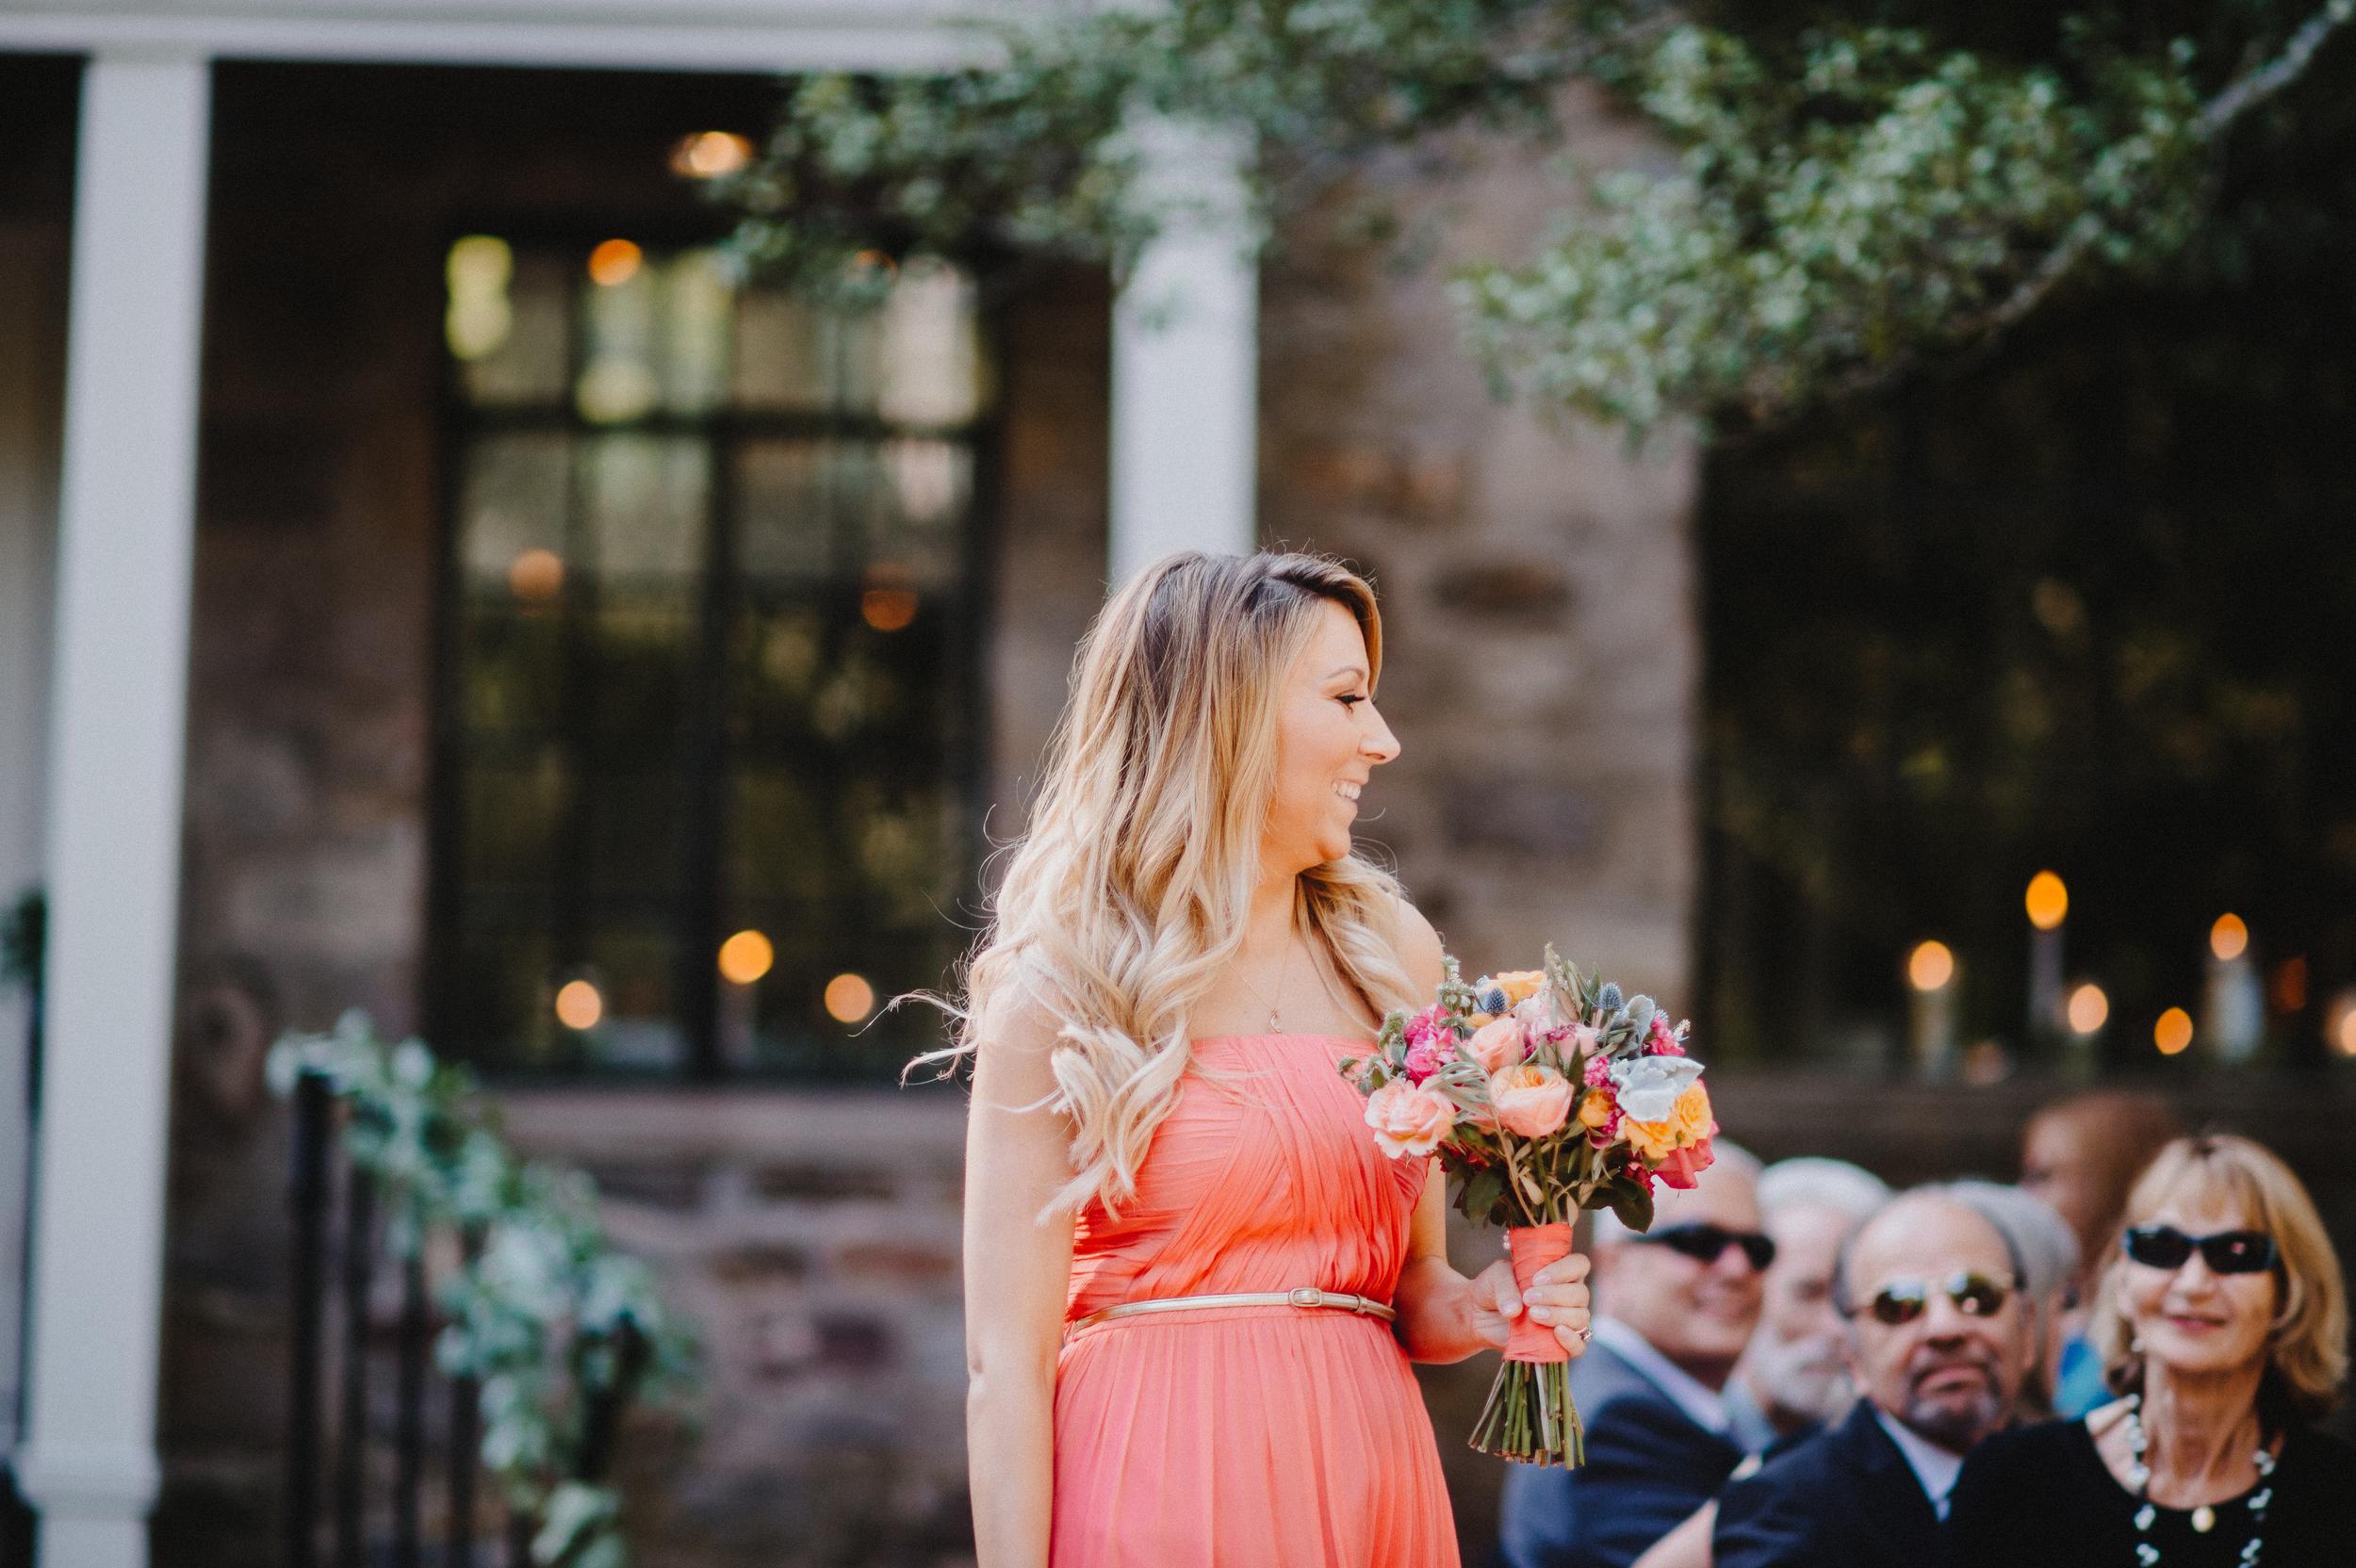 holly-hedge-estate-wedding-photographer-pat-robinson-photography-52.jpg